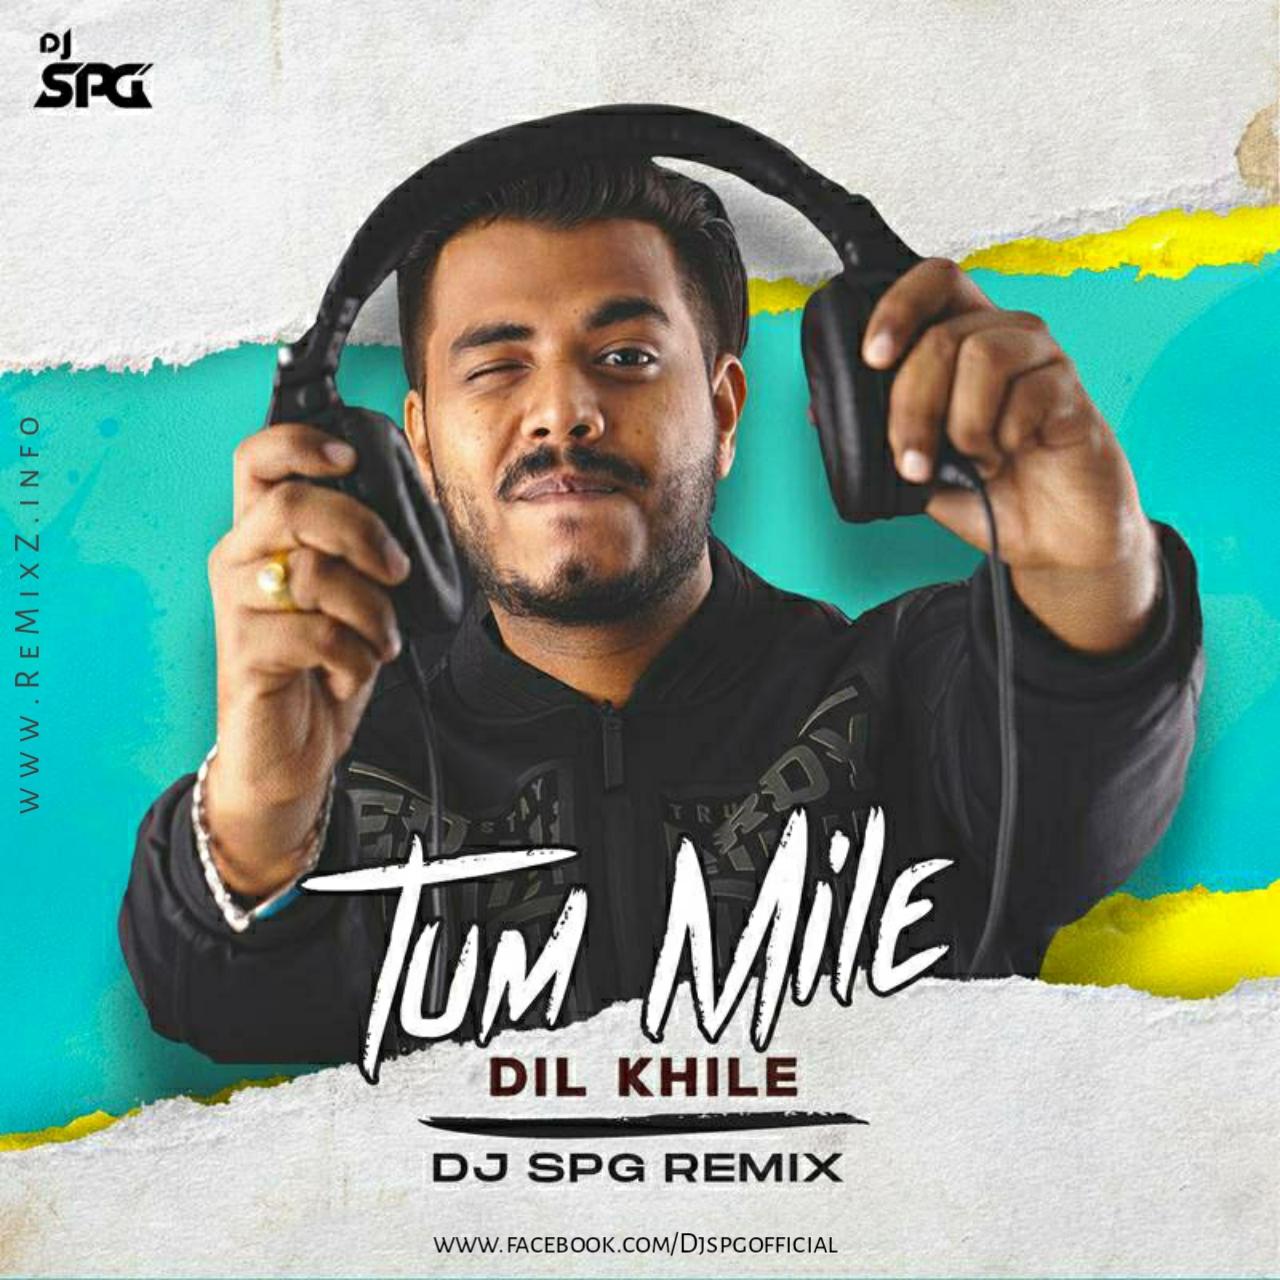 tum-mile-dil-khile-remix-dj-spg.jpg